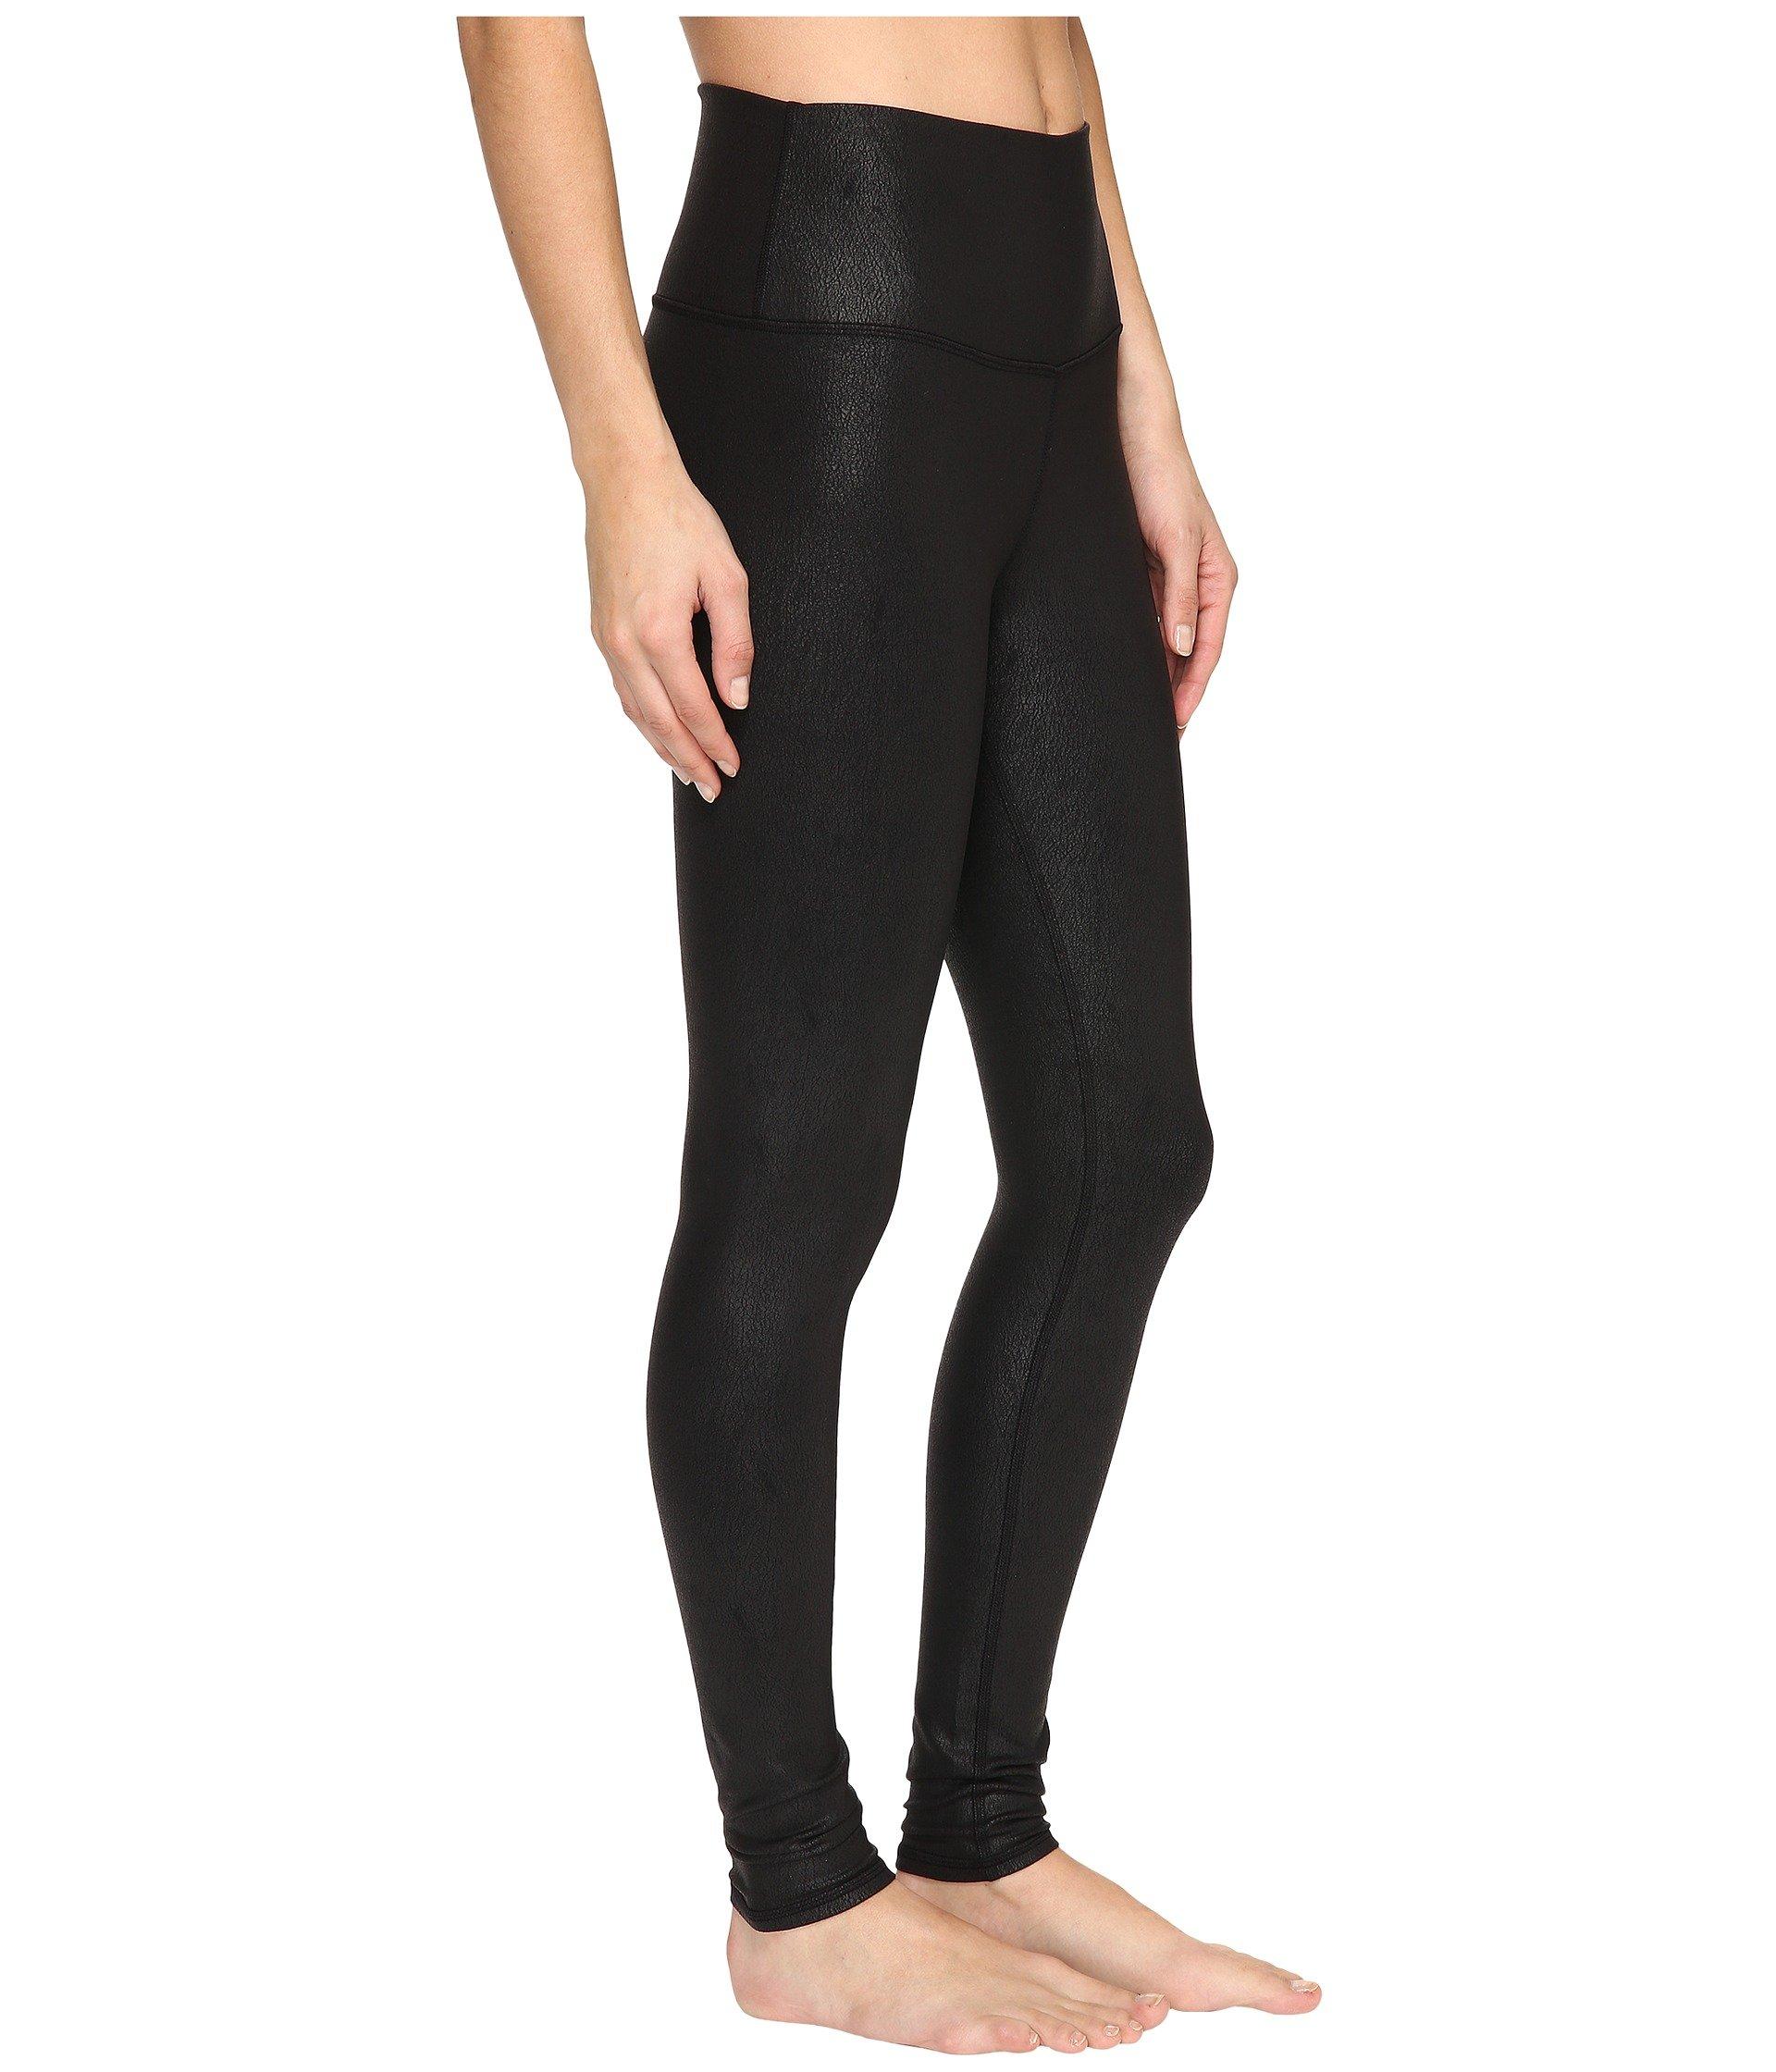 Black Waist Airbrushed Leggings High Alo Leather Performance qIwaHW4